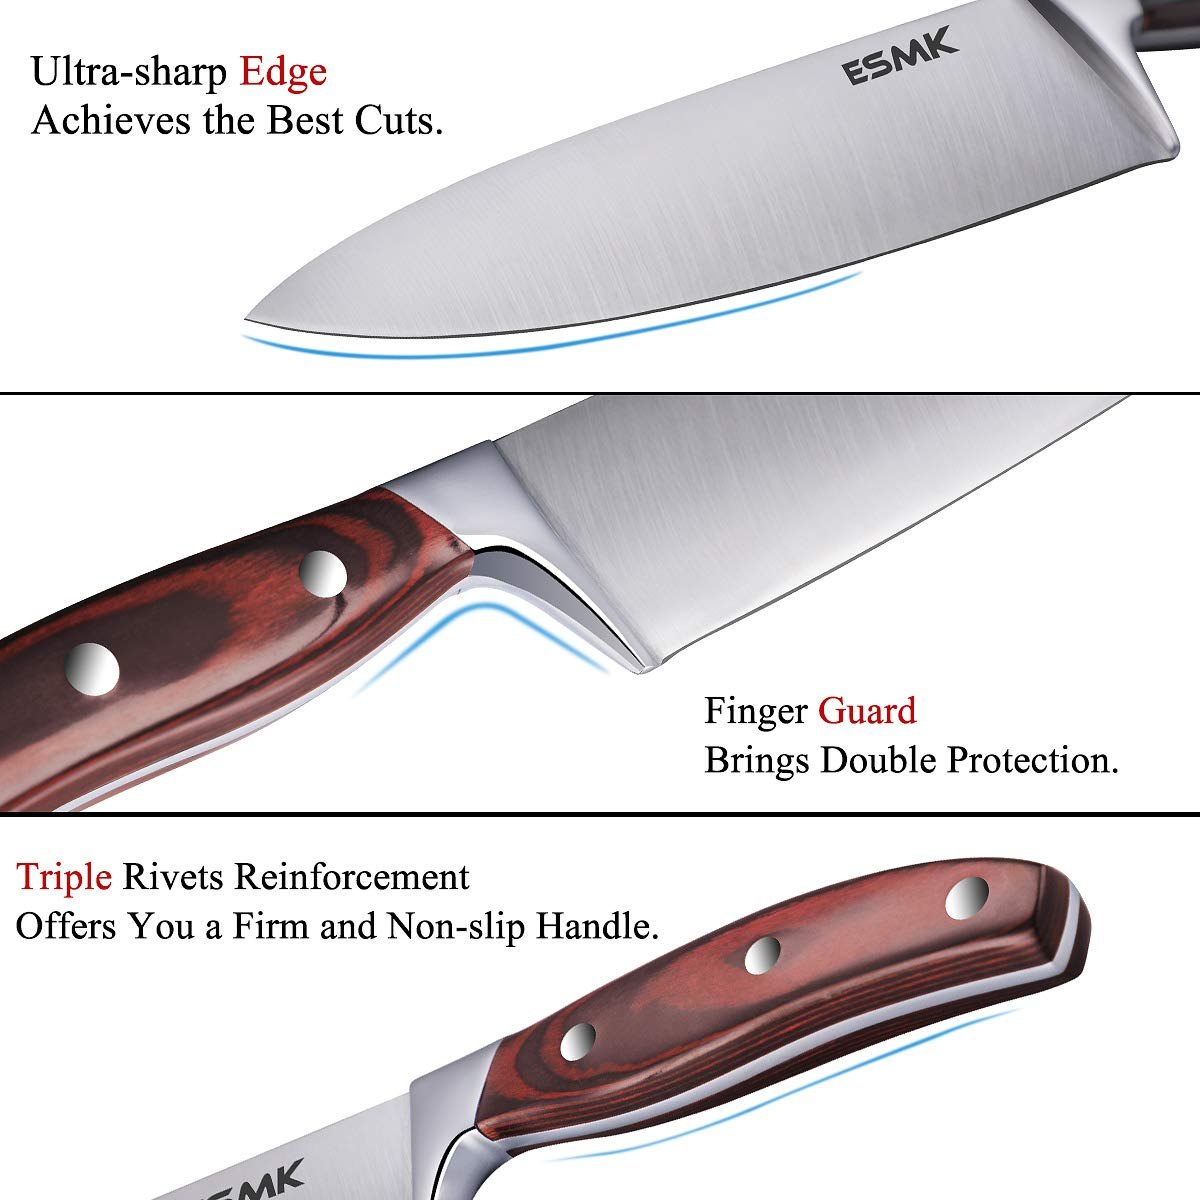 Knife Set, 15-Piece Kitchen Knife Set with Block Wooden, Manual Sharpening for Chef Knife Block Set, German Stainless Steel, ESMK (15 PCs Knife Block Set) by ESMK (Image #5)